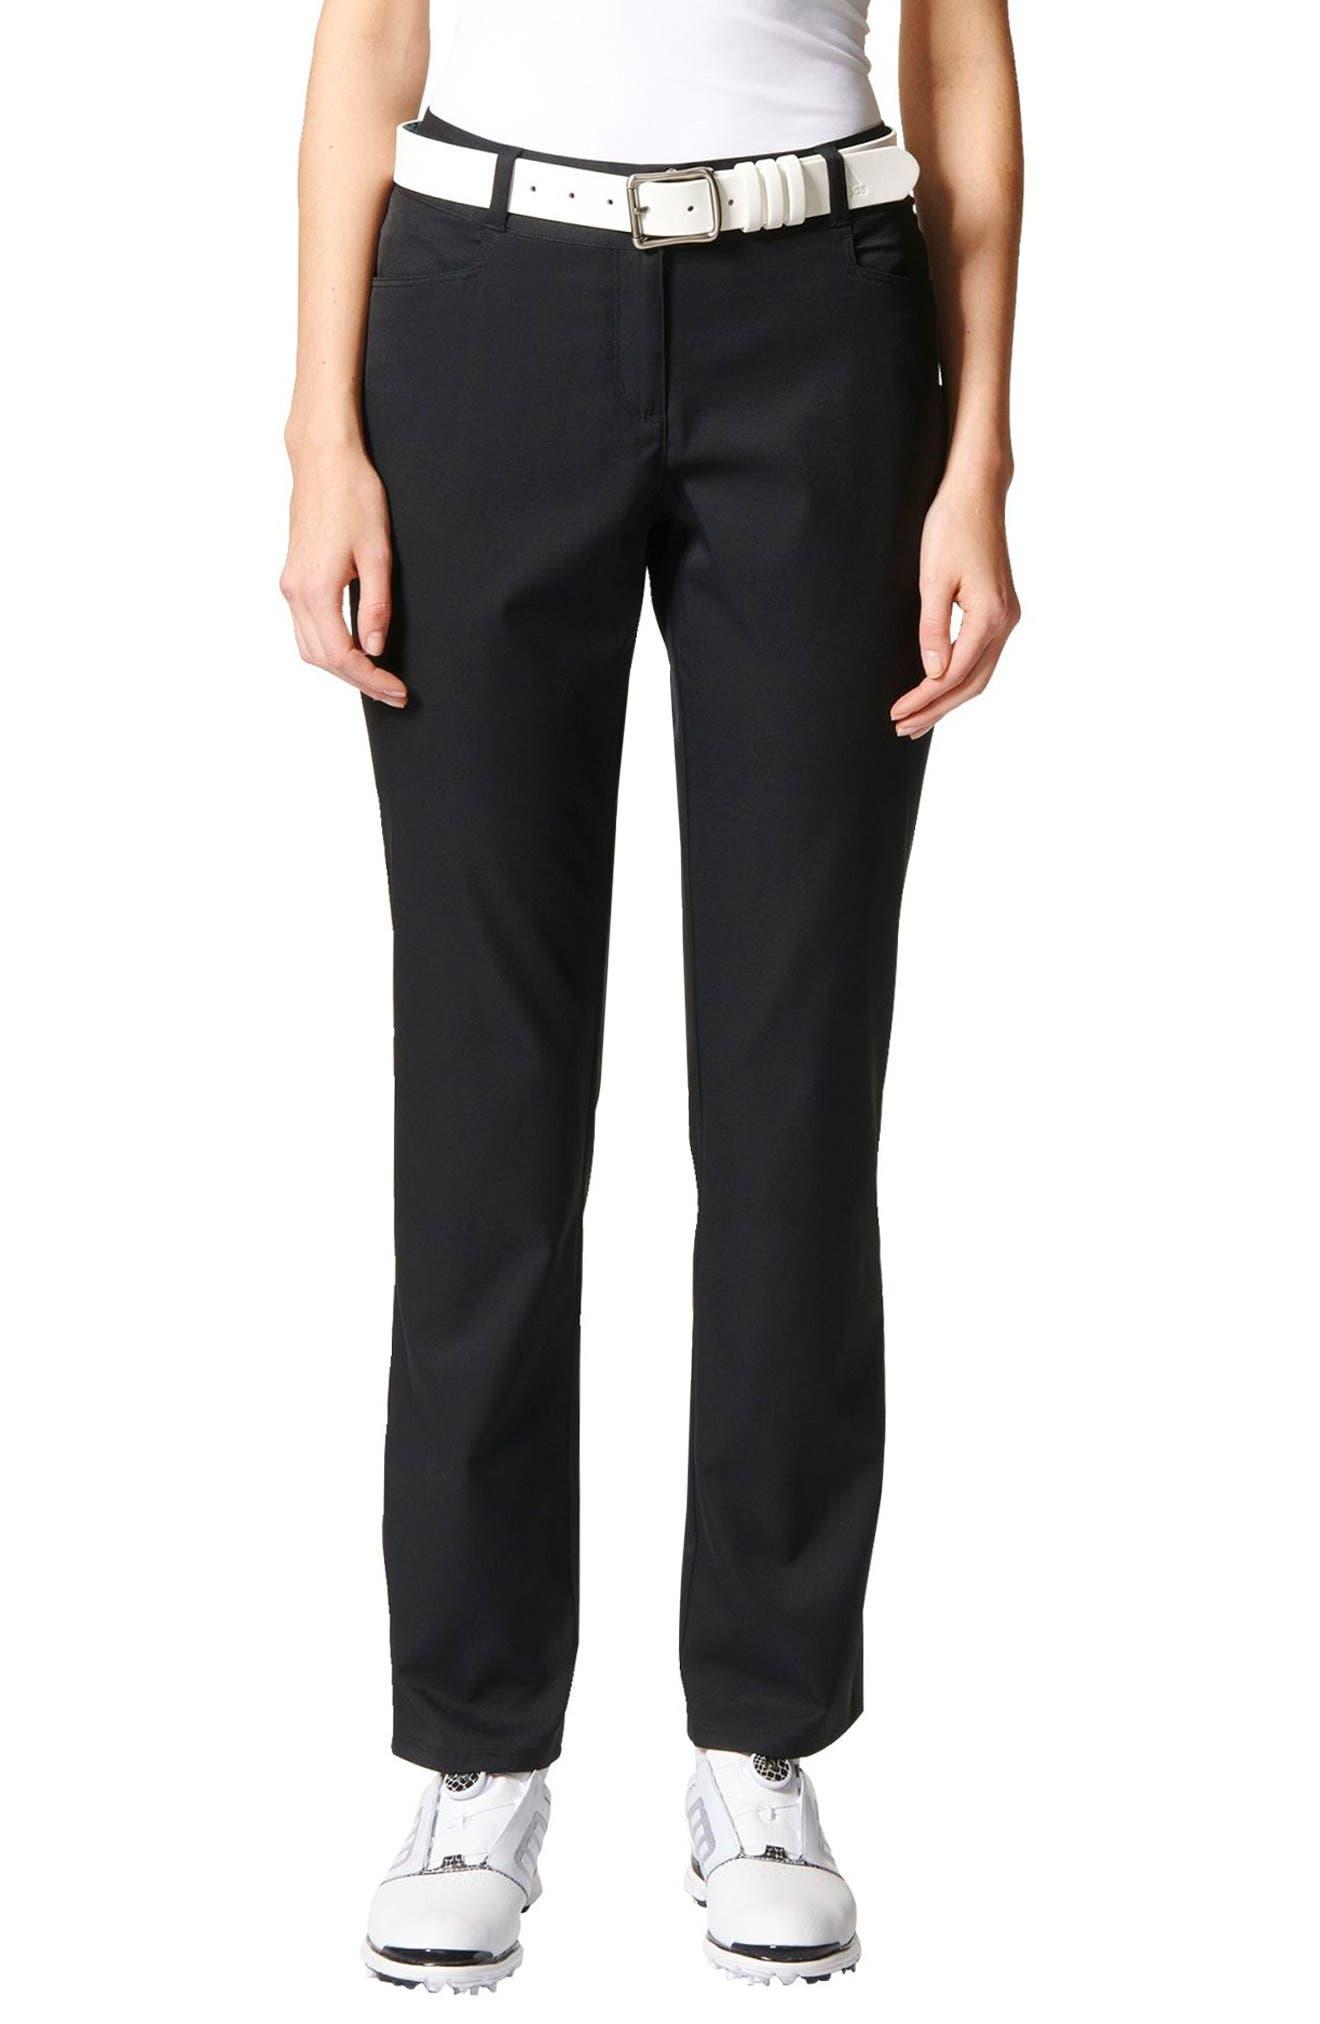 Main Image - adidas Full Length Golf Pants